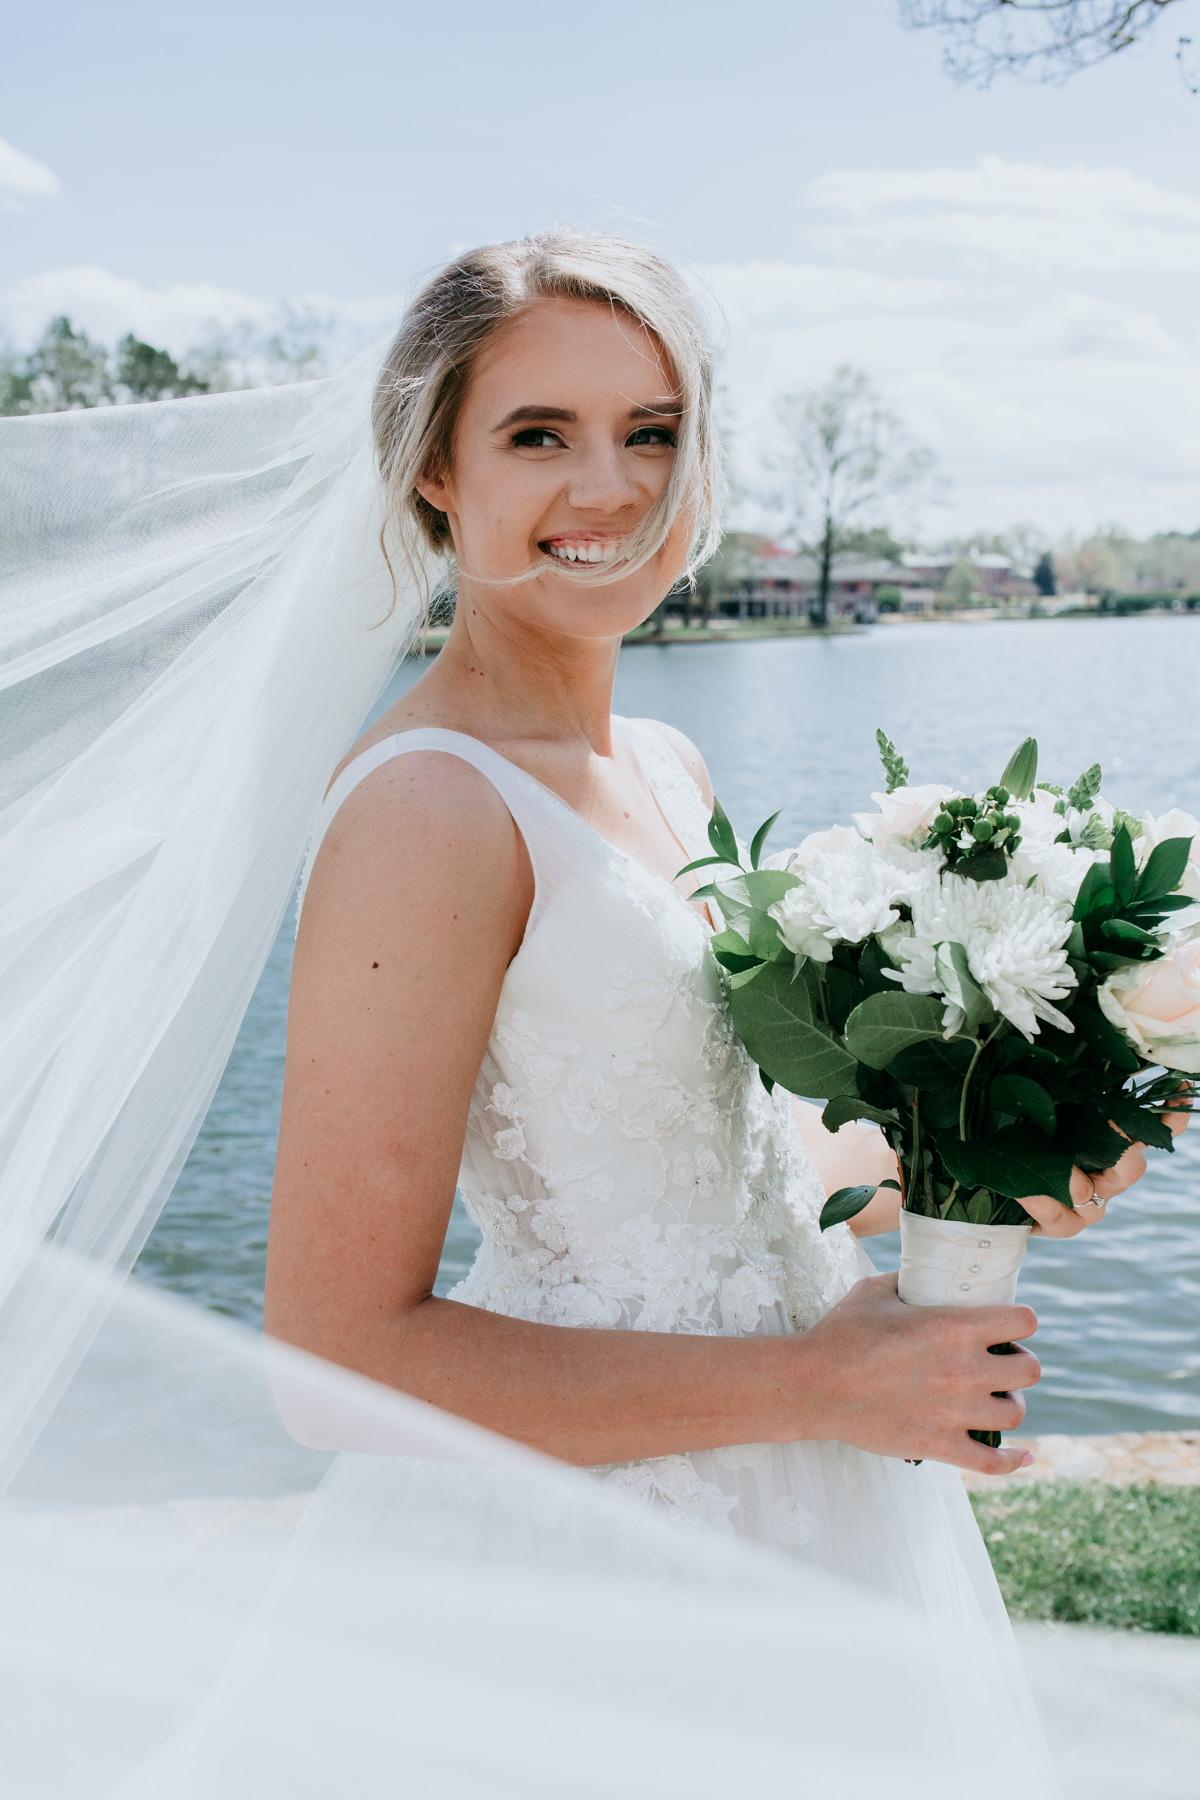 cute-bride-photo-session.jpg